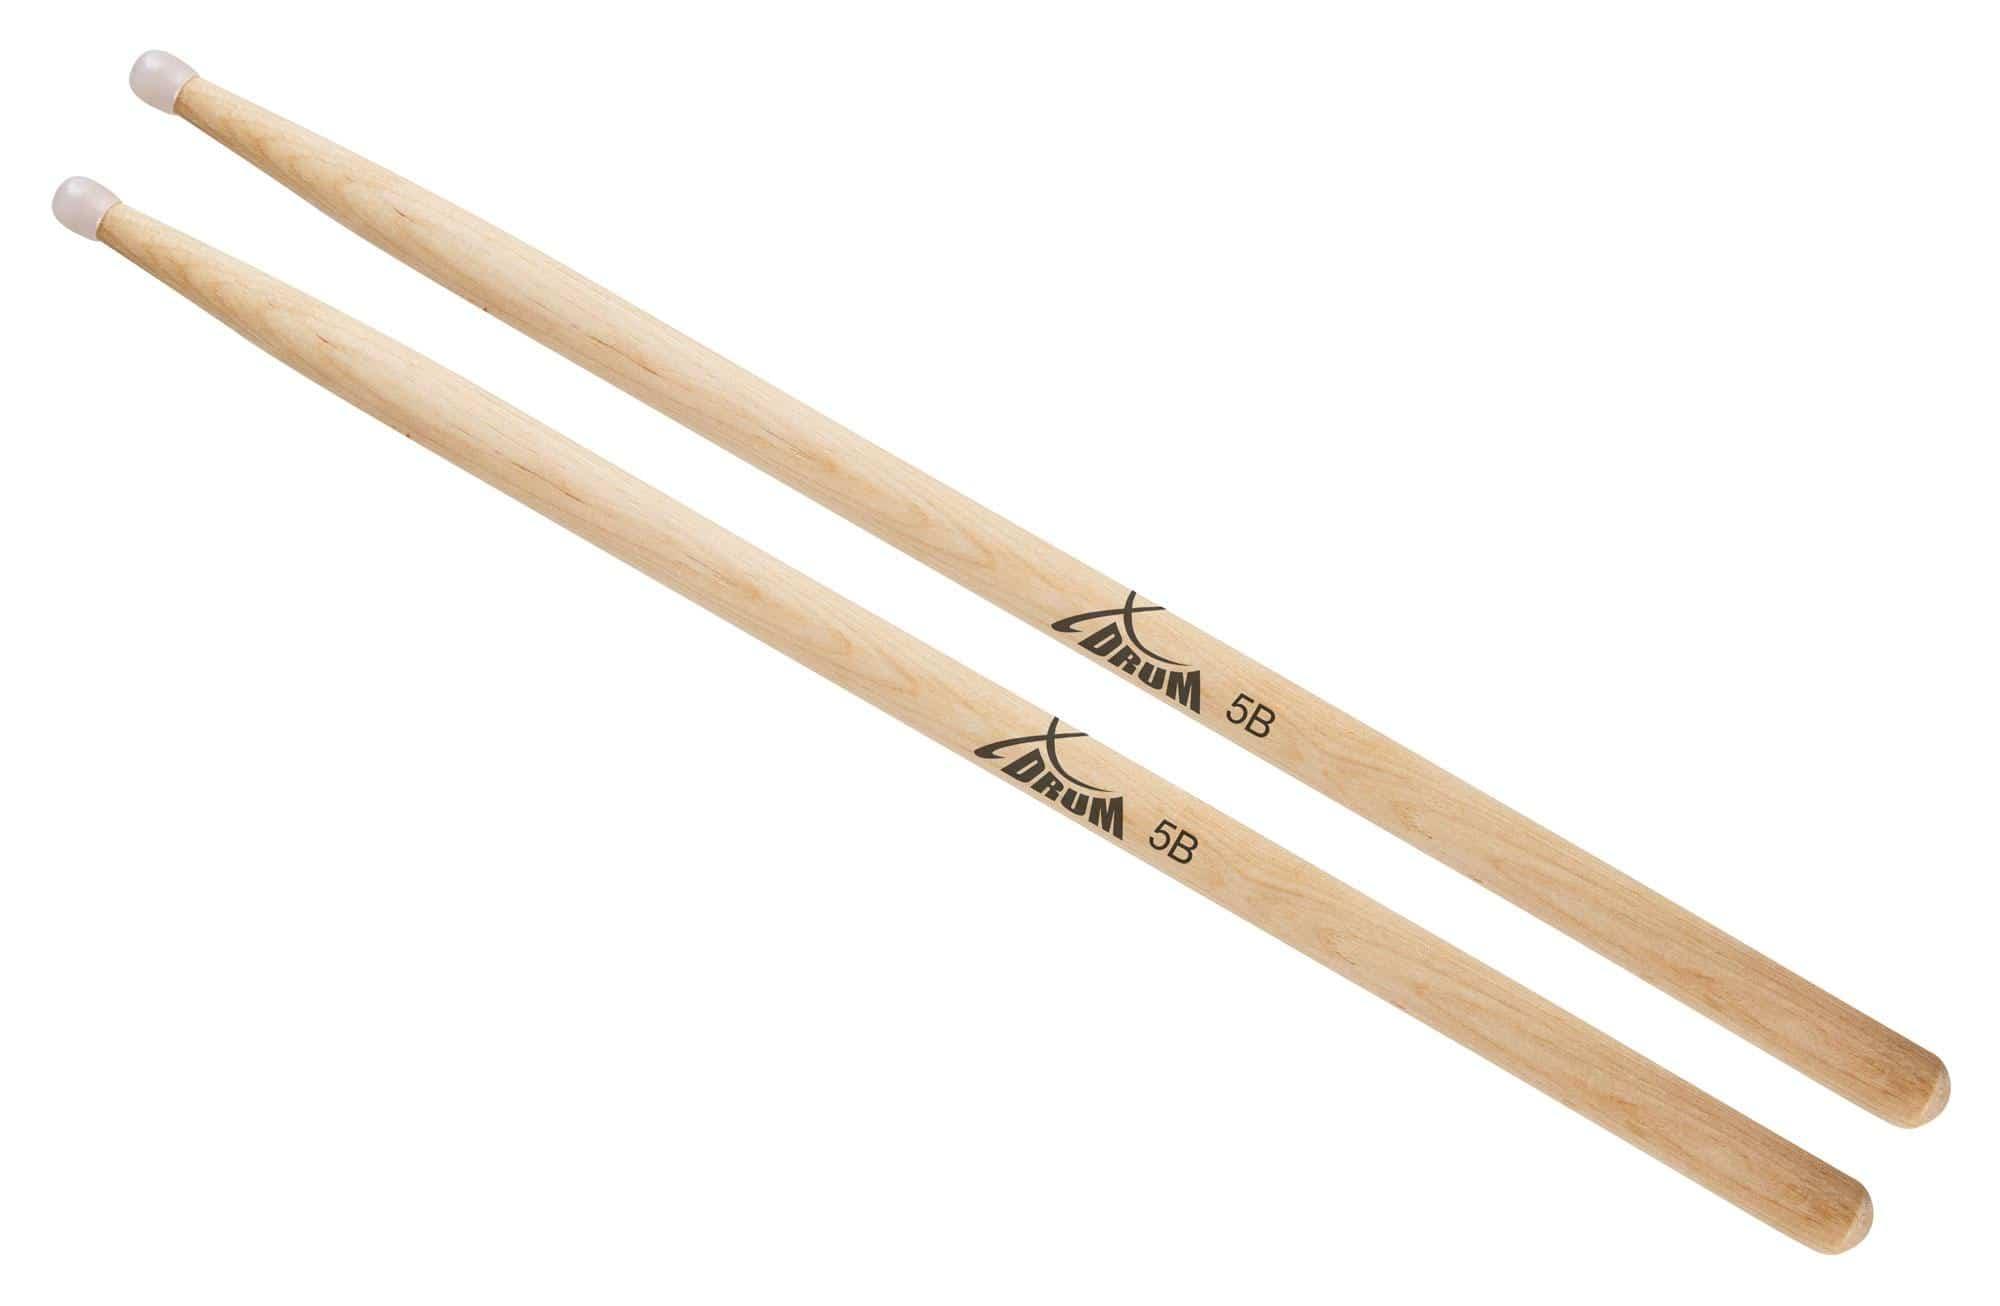 XDrum Schlagzeug Sticks 5B Nylon Tip